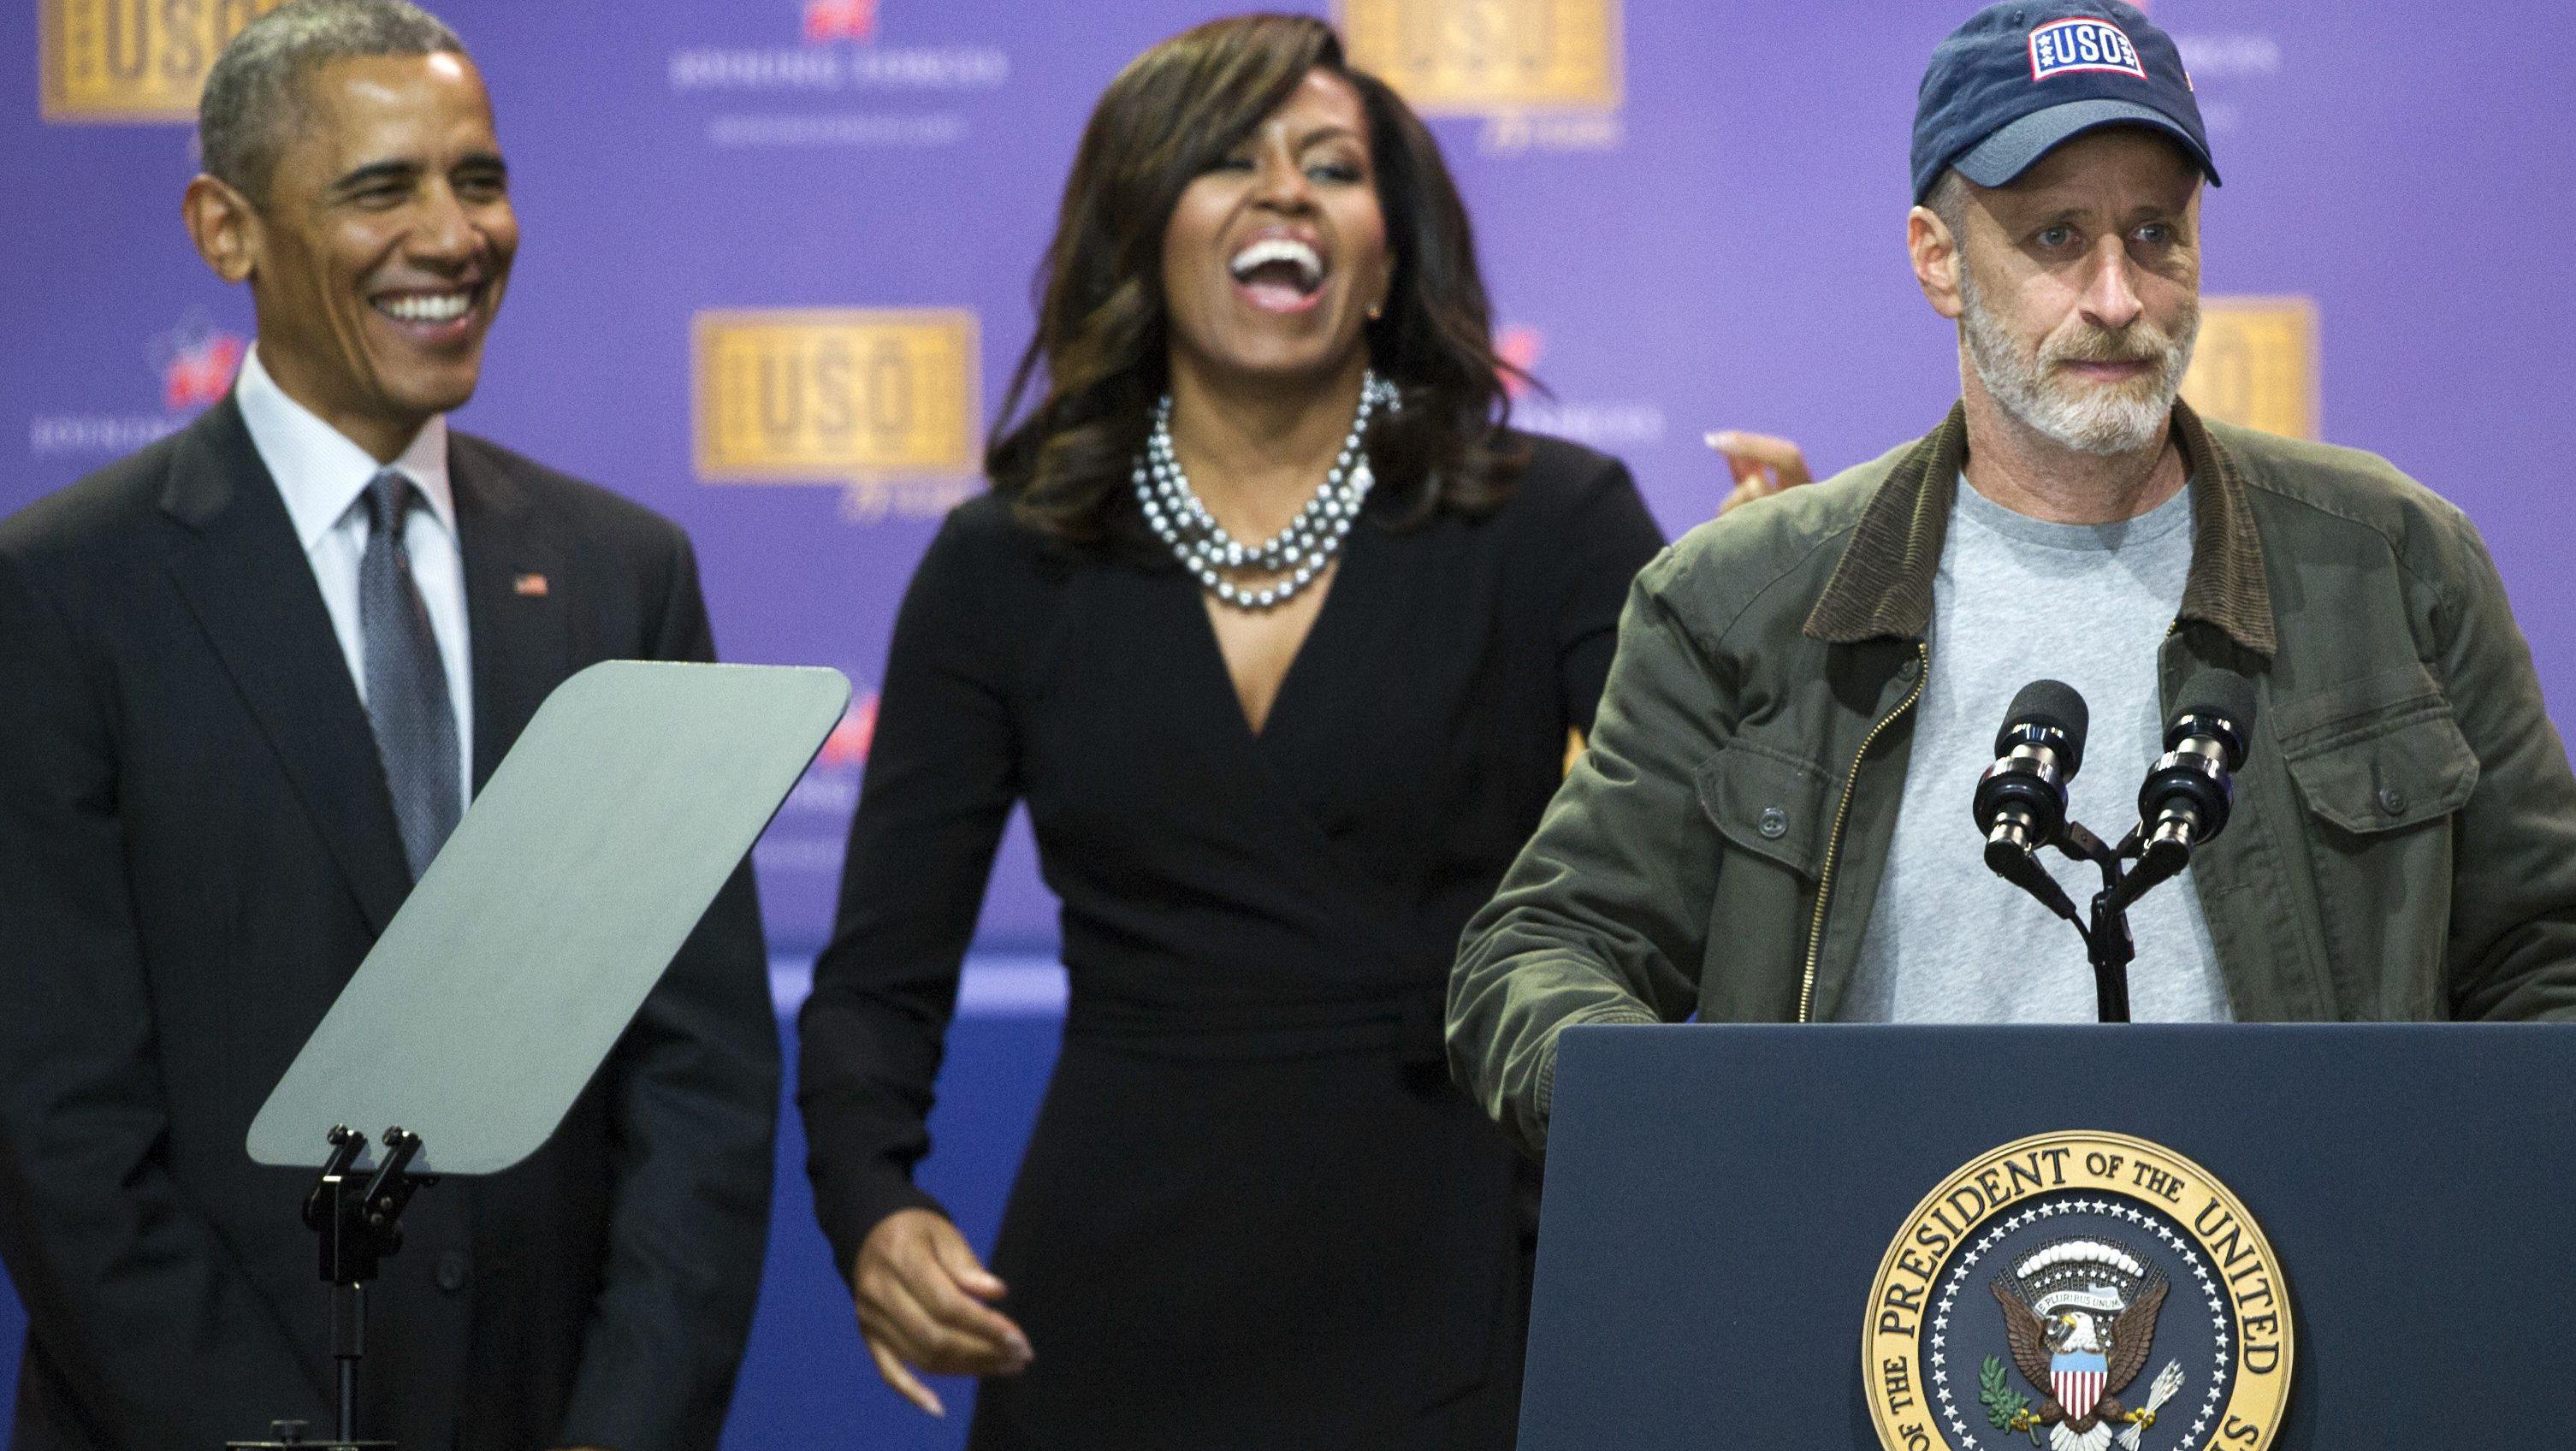 Jon Stewart, Barack Obama, Michelle Obama